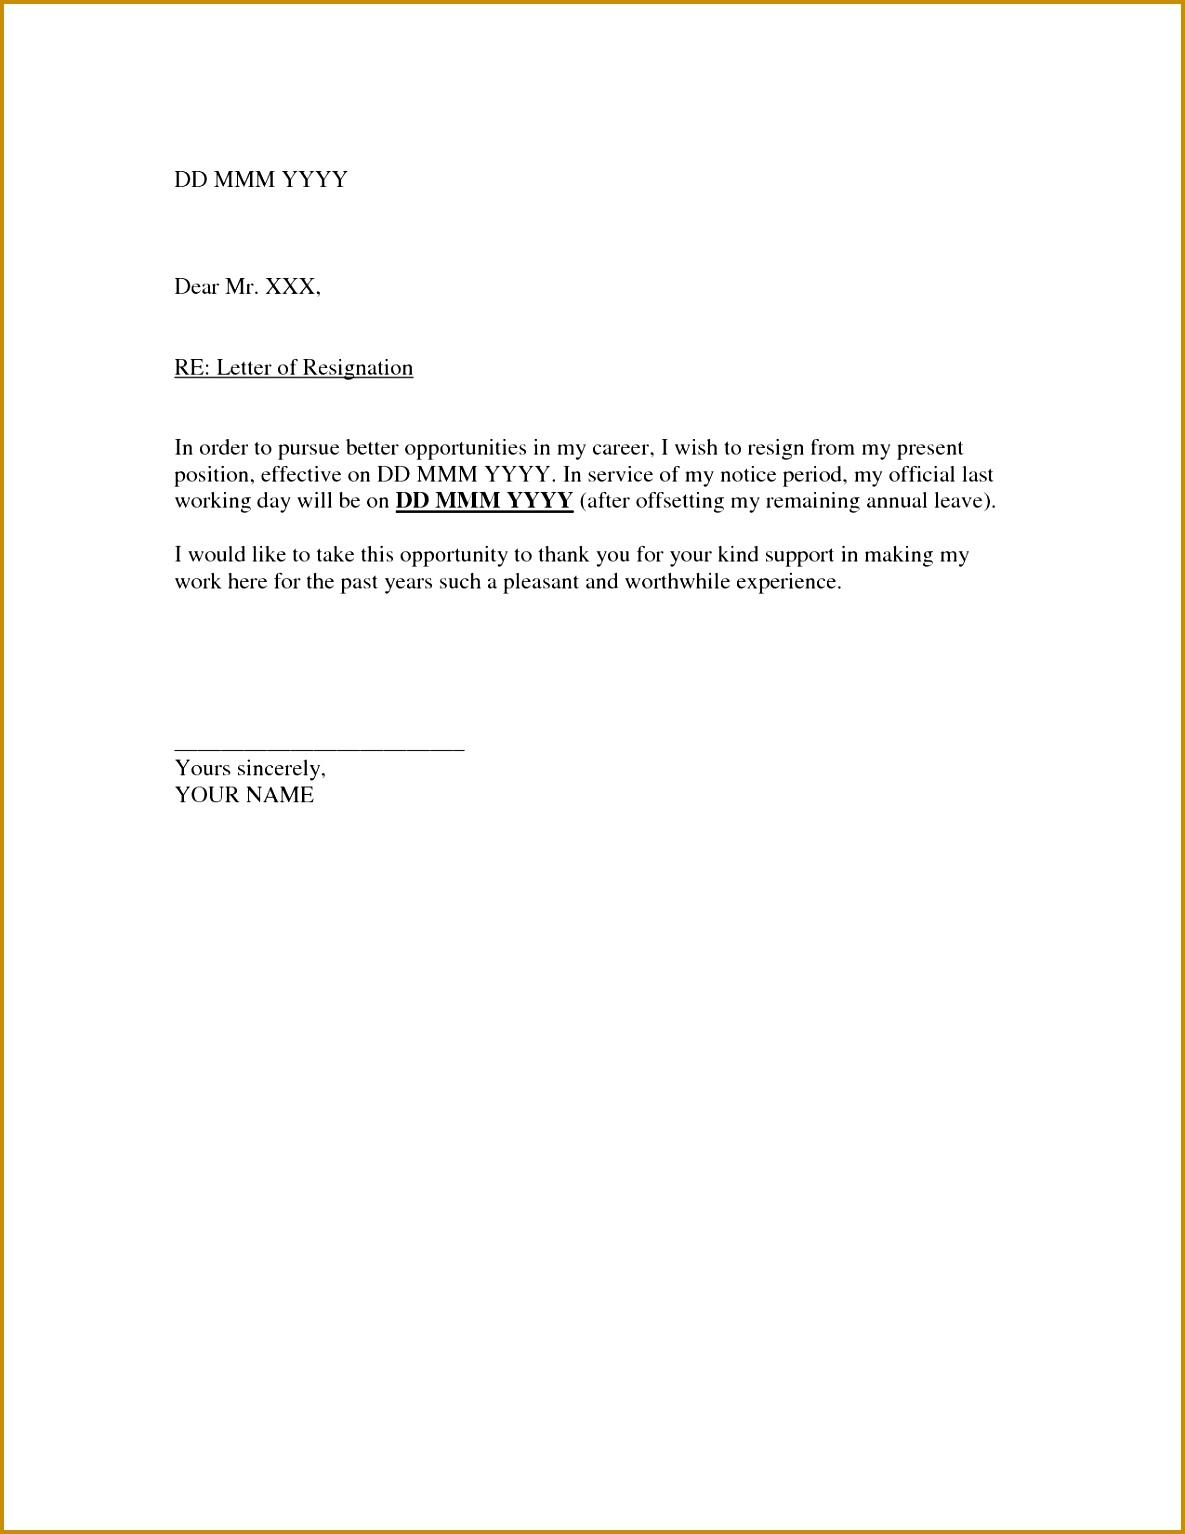 quitting letter 15341185